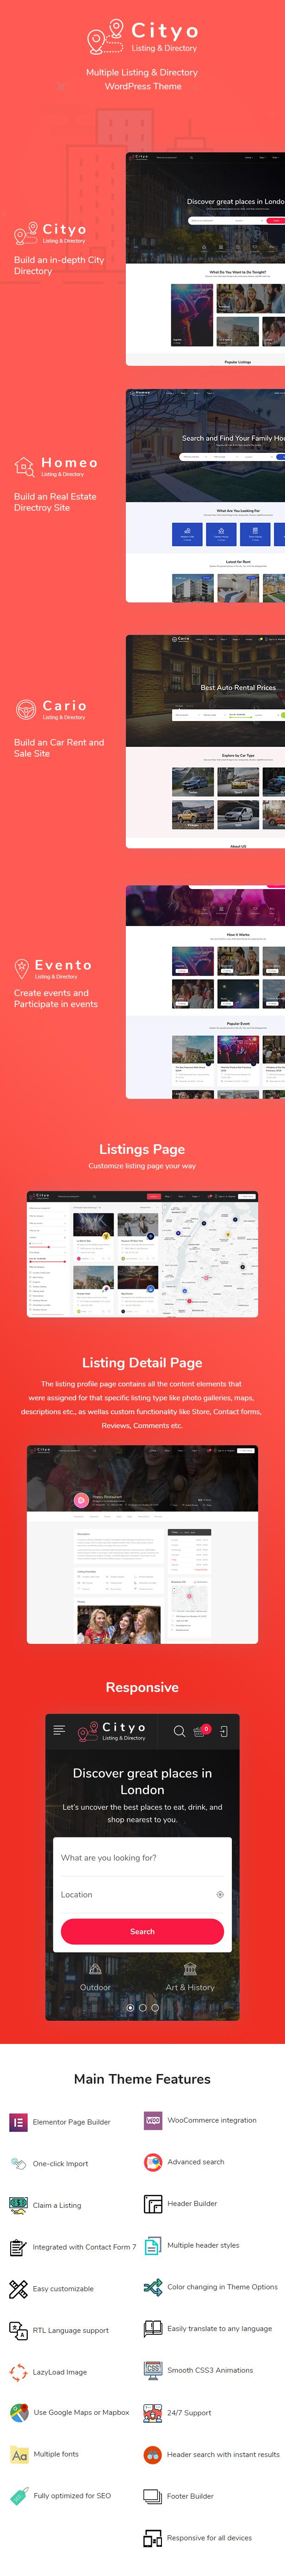 Cityo - Multiple Listing Directory WordPress Theme - 5